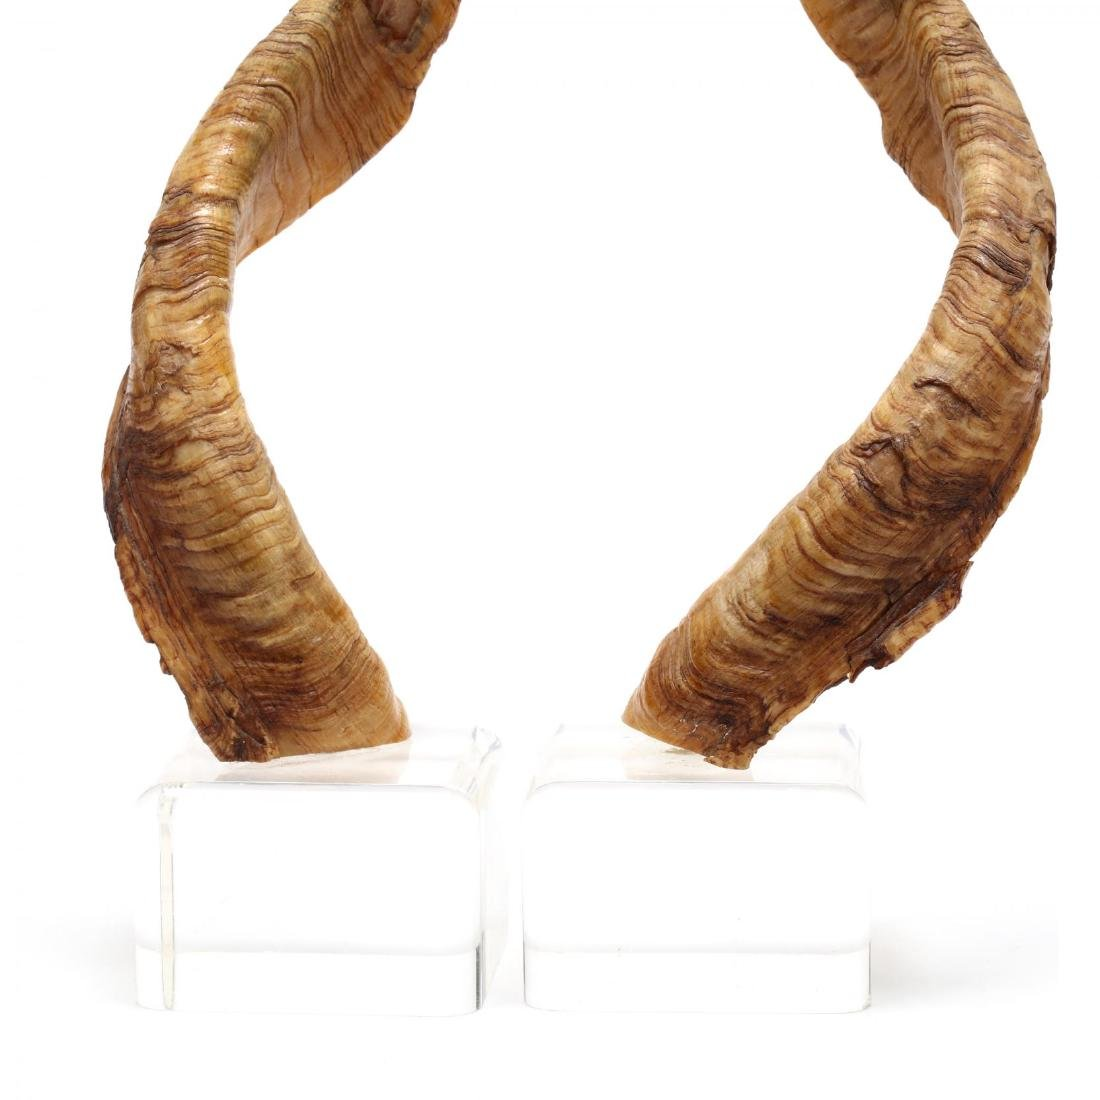 Pair of Kudo Horns on Lucite Bases - 2